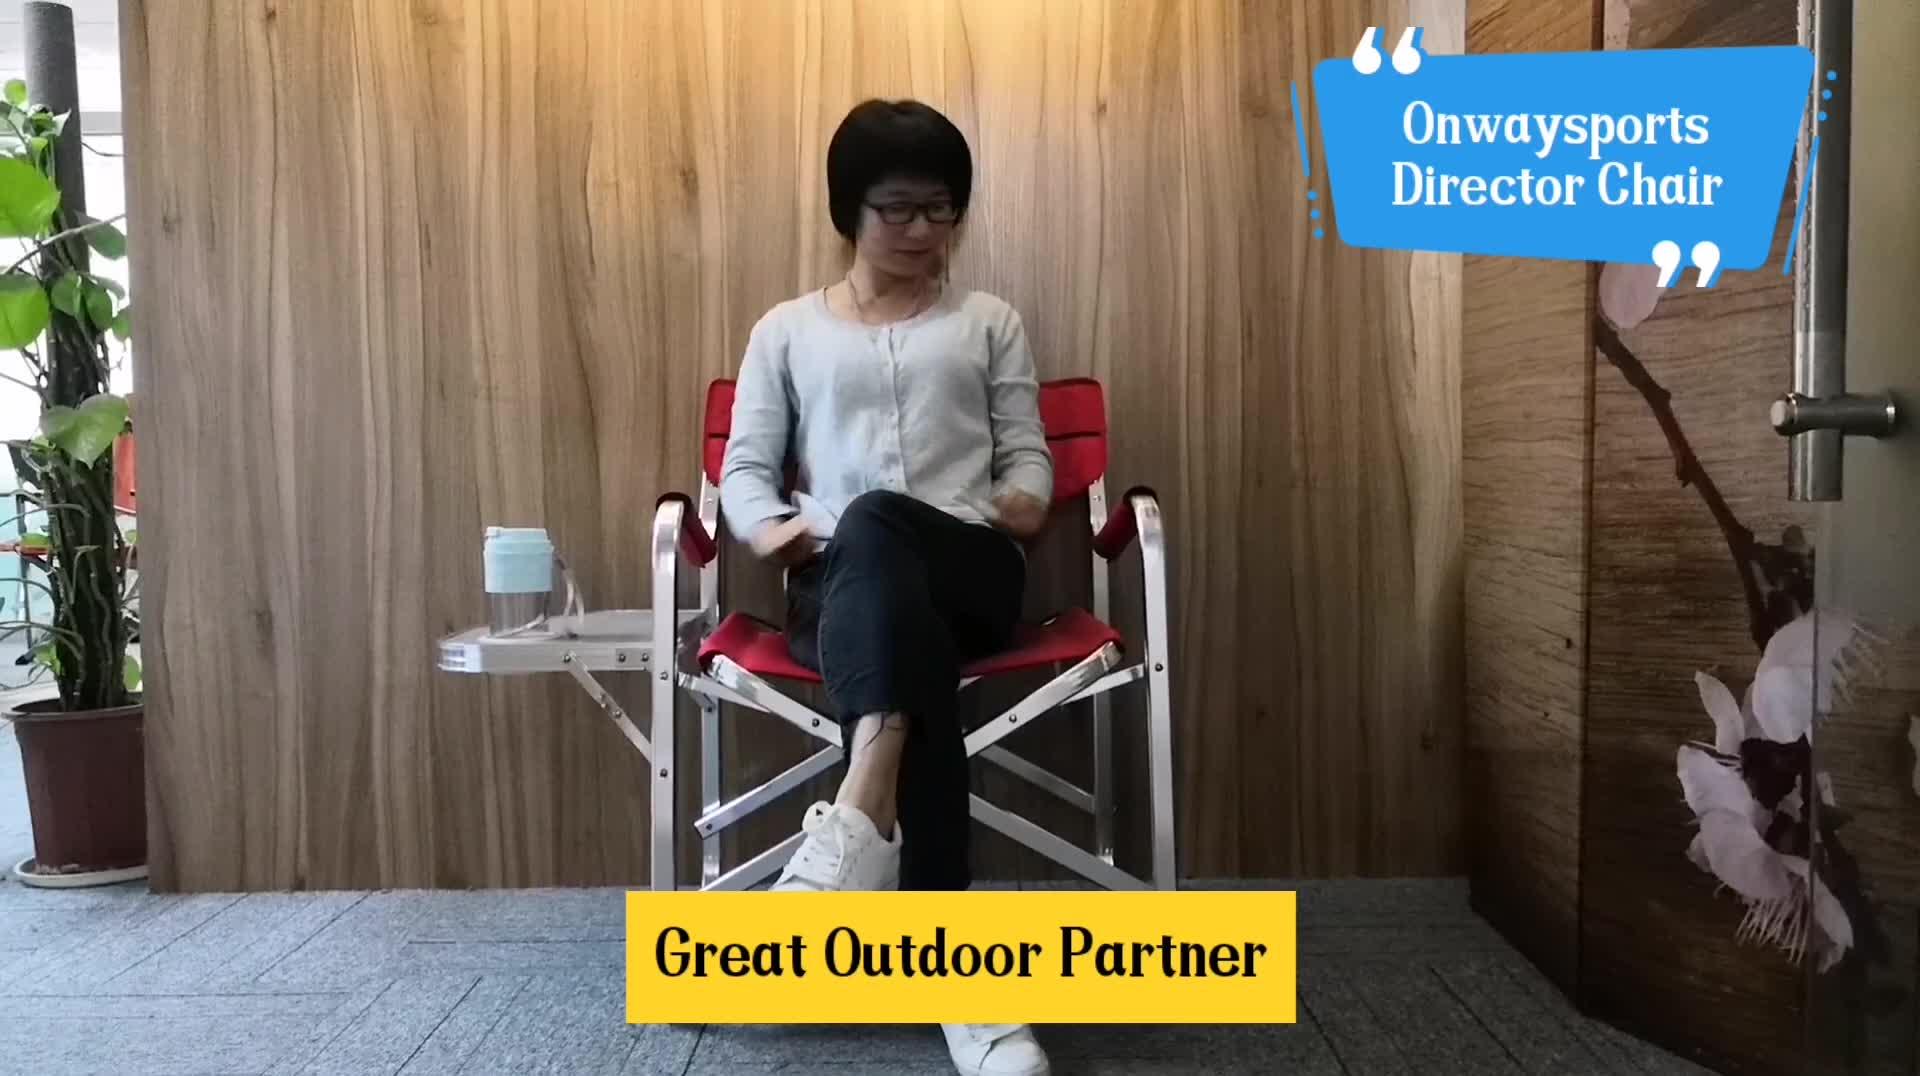 Onwaysports Wholesale China 경량 접는 캠핑 자 OW-N65T-BK